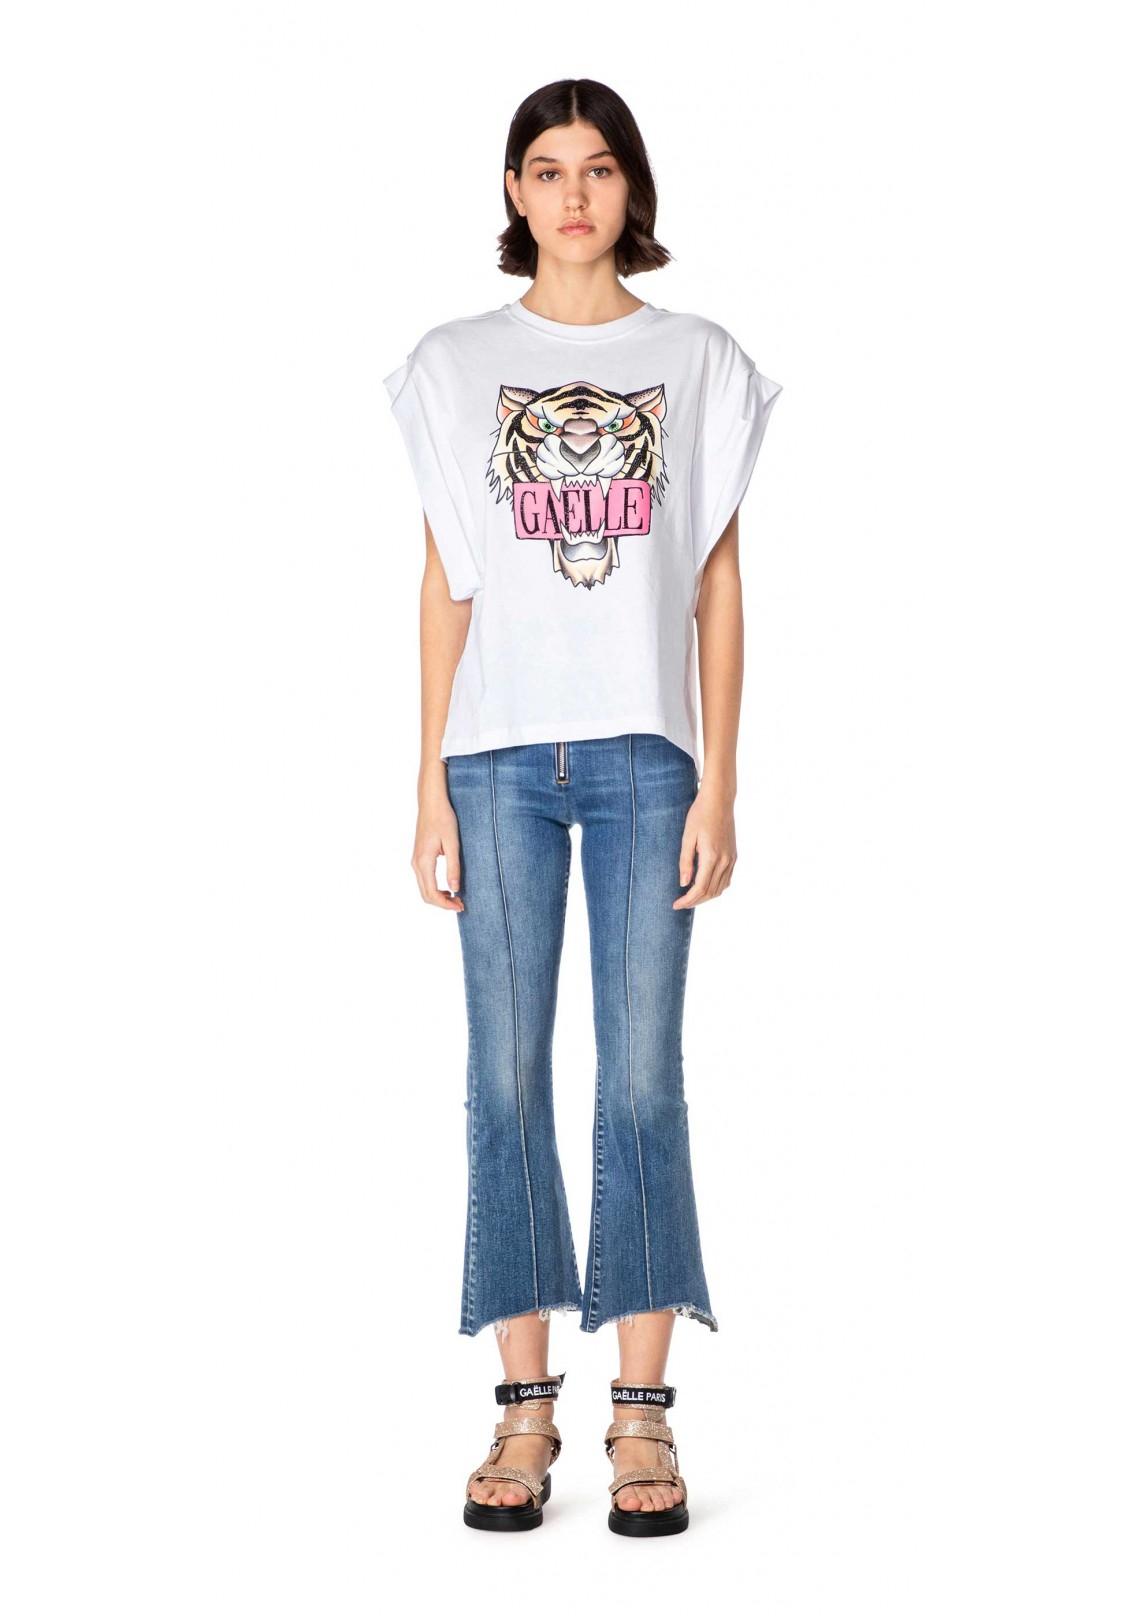 T-shirt con stampa tigre gaelle paris